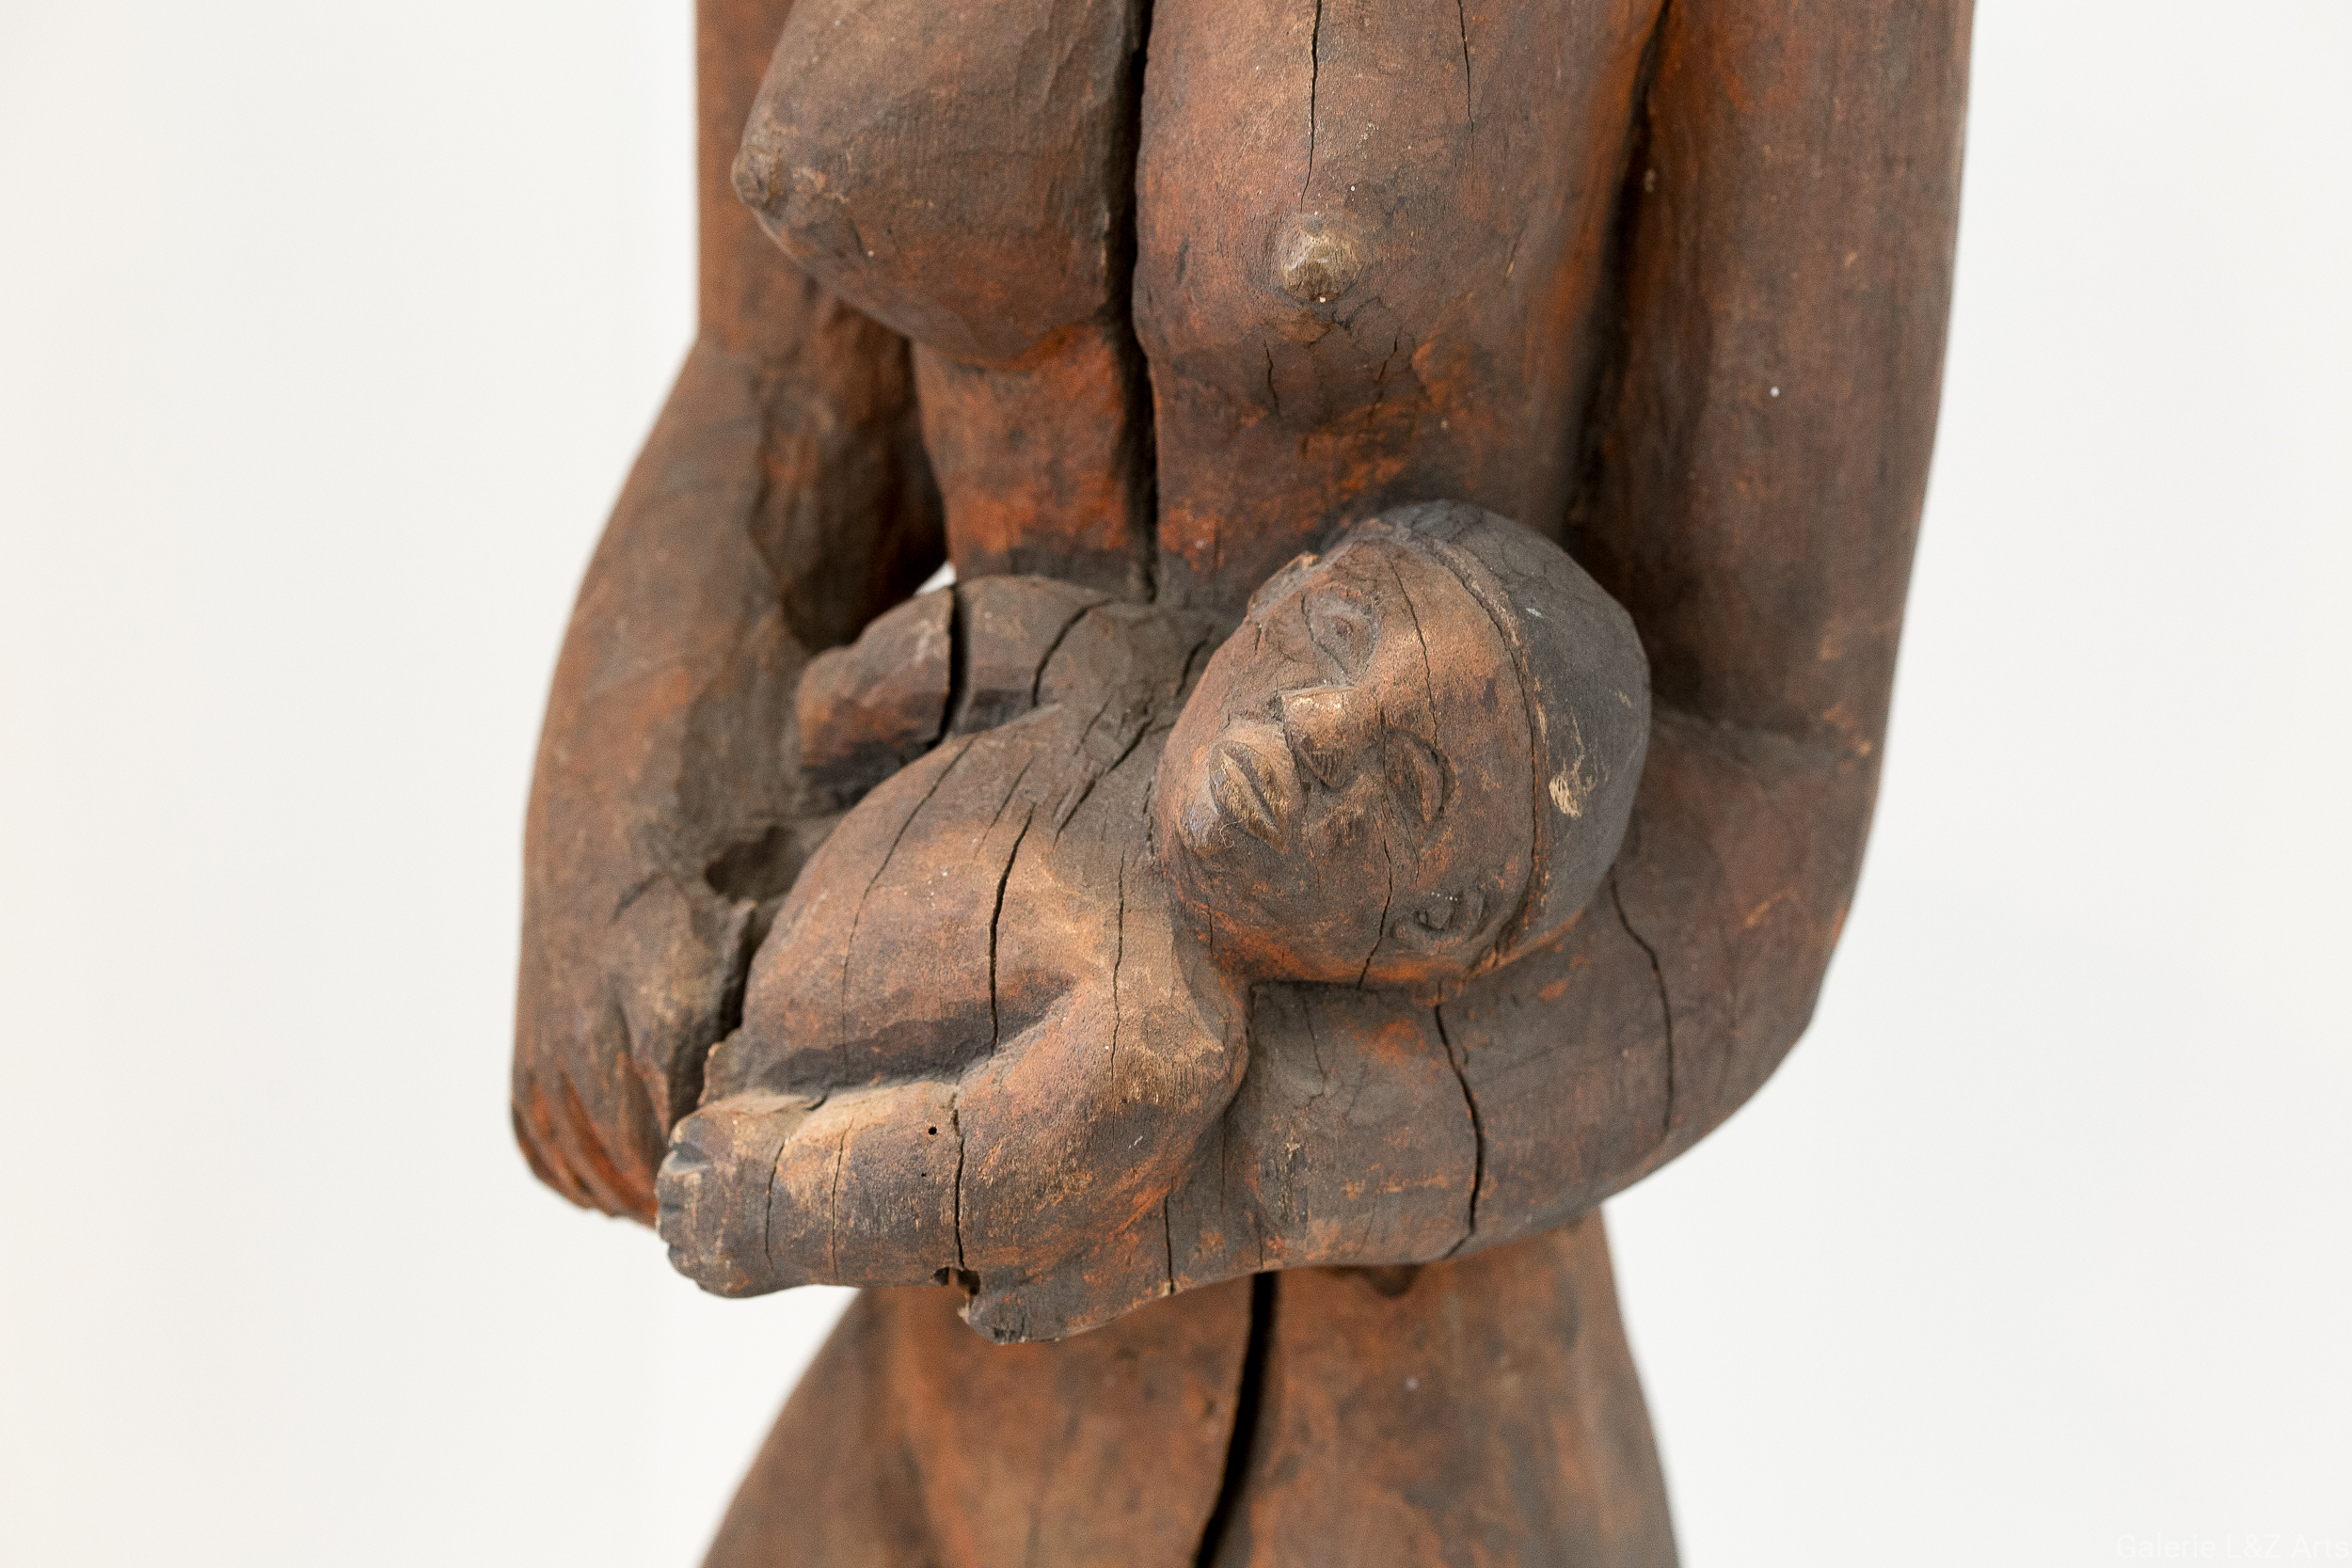 tribal-art-oostende-ostende-exposition-galerie-lz-art-africain-belgique-21.jpg